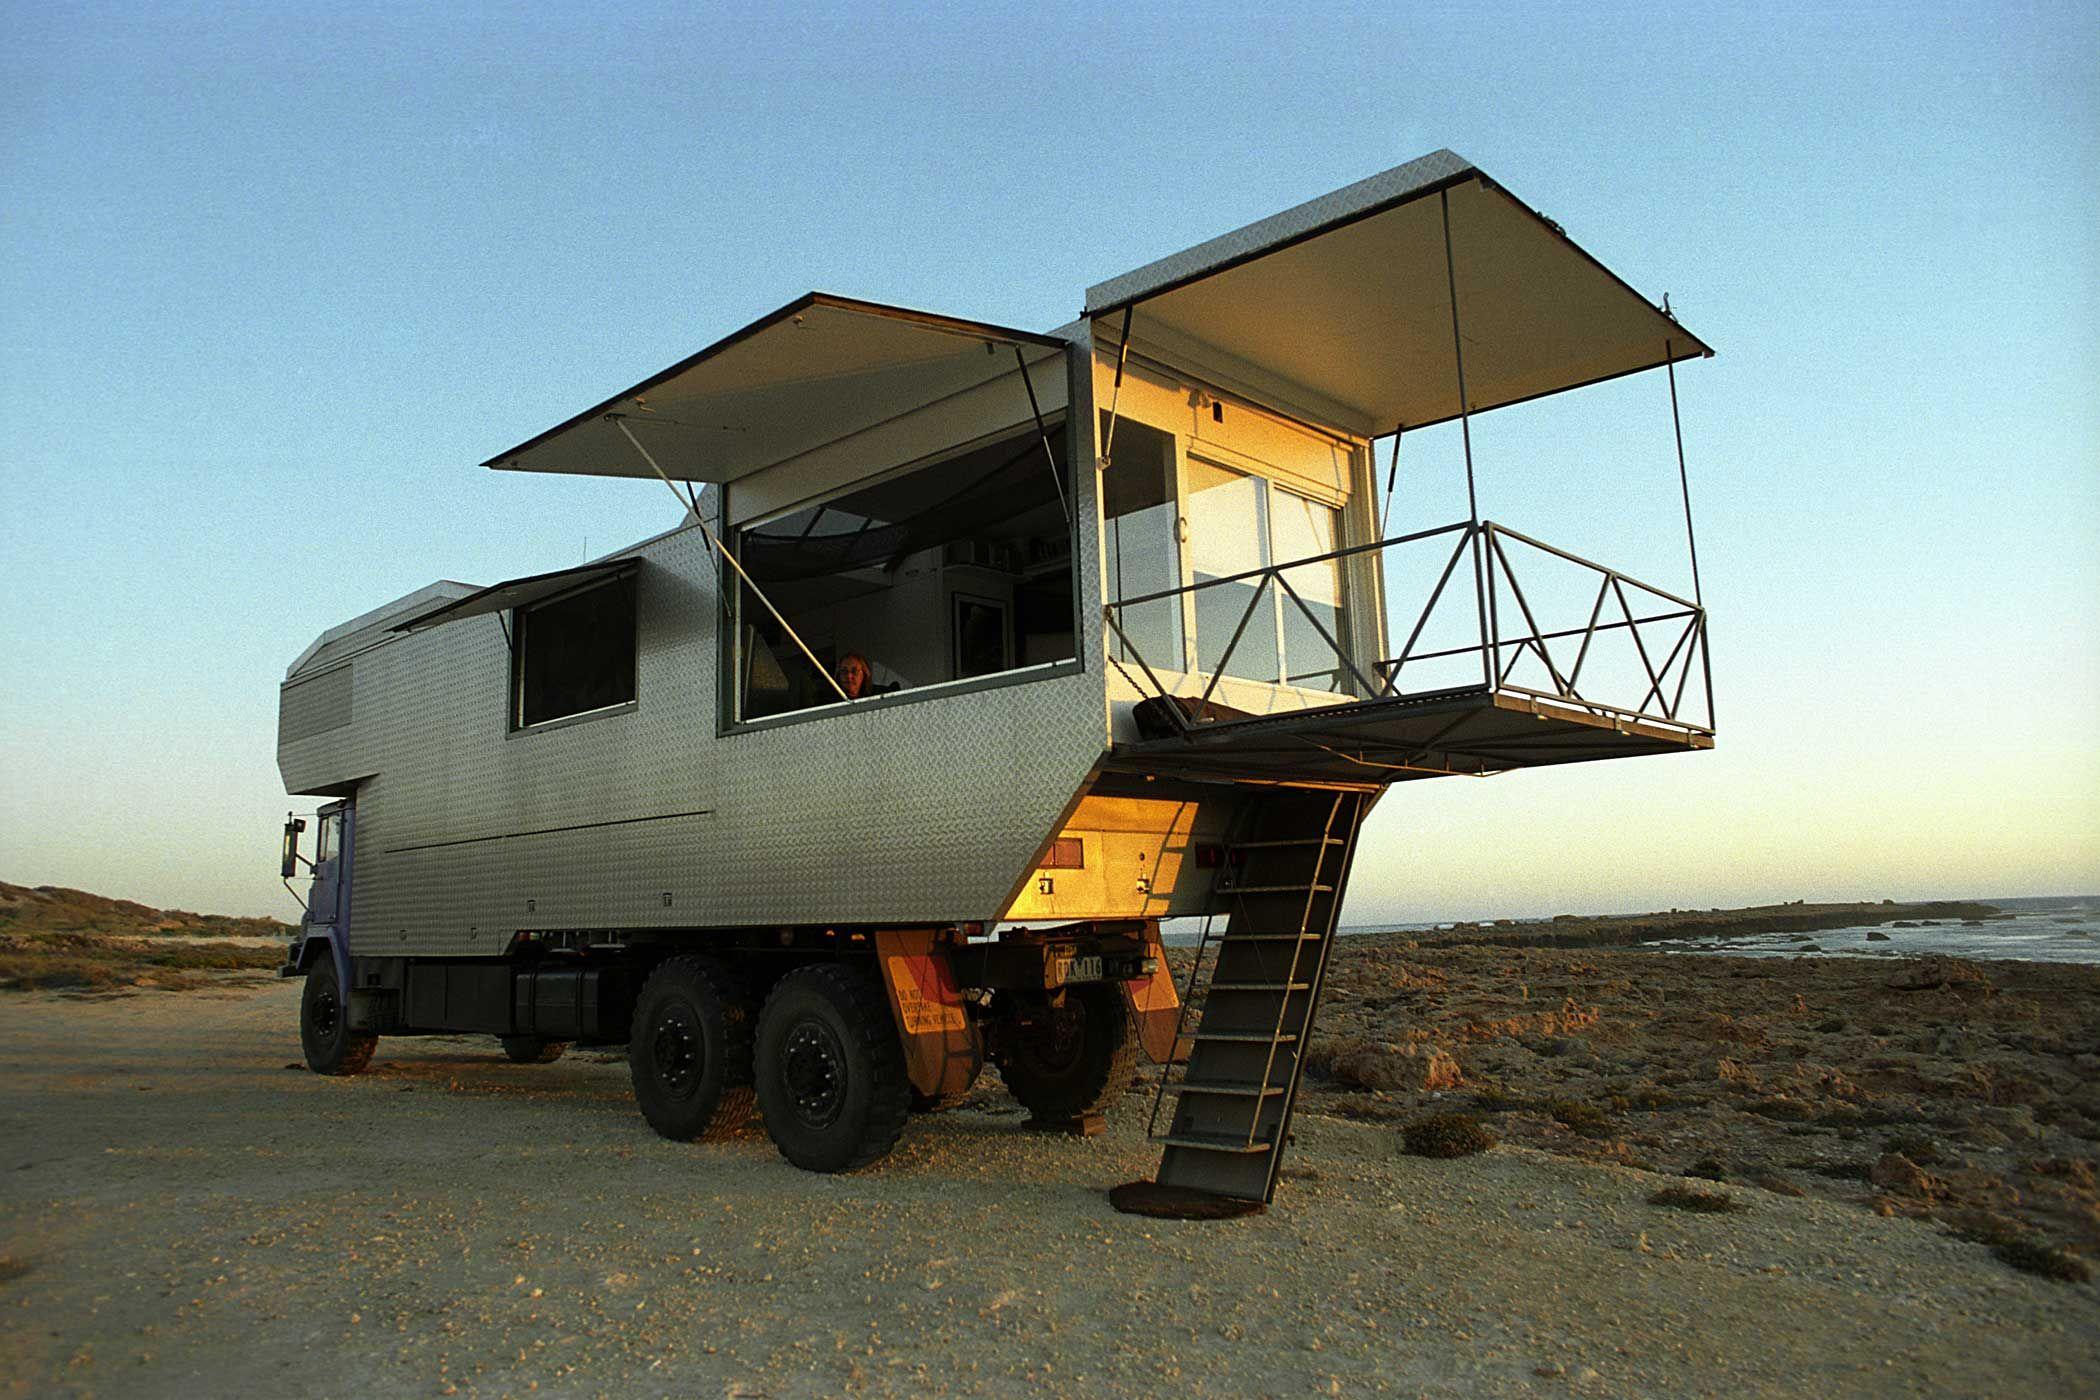 Unimog Camper For Sale >> It's Australia's Weirdest Off-Road Motorhome! via Motornomadics.com | Nomadic Art & Design ...